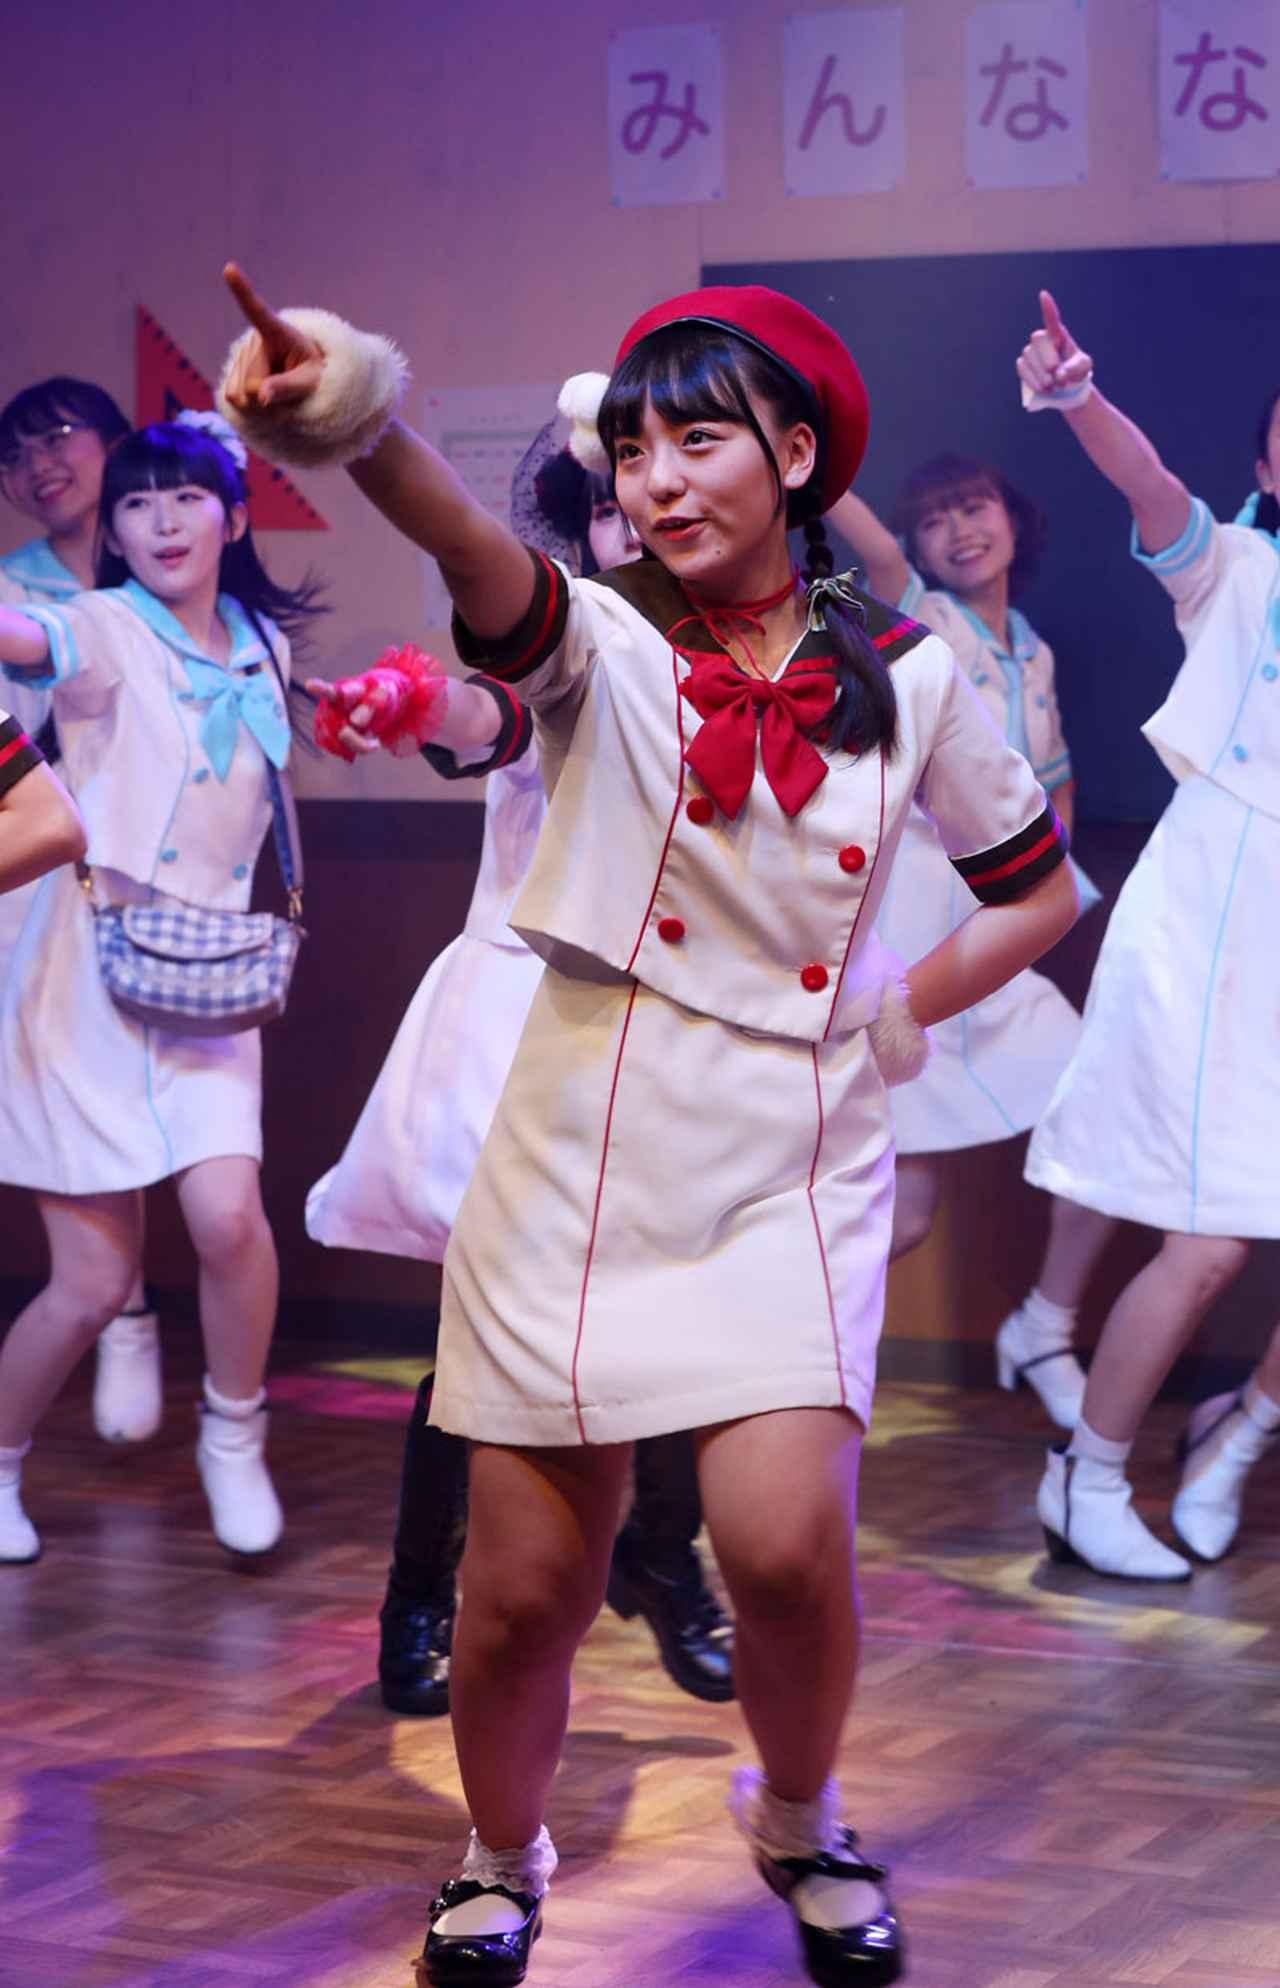 Images : 11番目の画像 - 「東城希明/アリスインプロジェクト最新舞台「アイガク2019」に愛らしいウサギ=プルスとして出演中! 「ダンスも芝居も、一番輝くぞと思いながら頑張っています」」のアルバム - Stereo Sound ONLINE